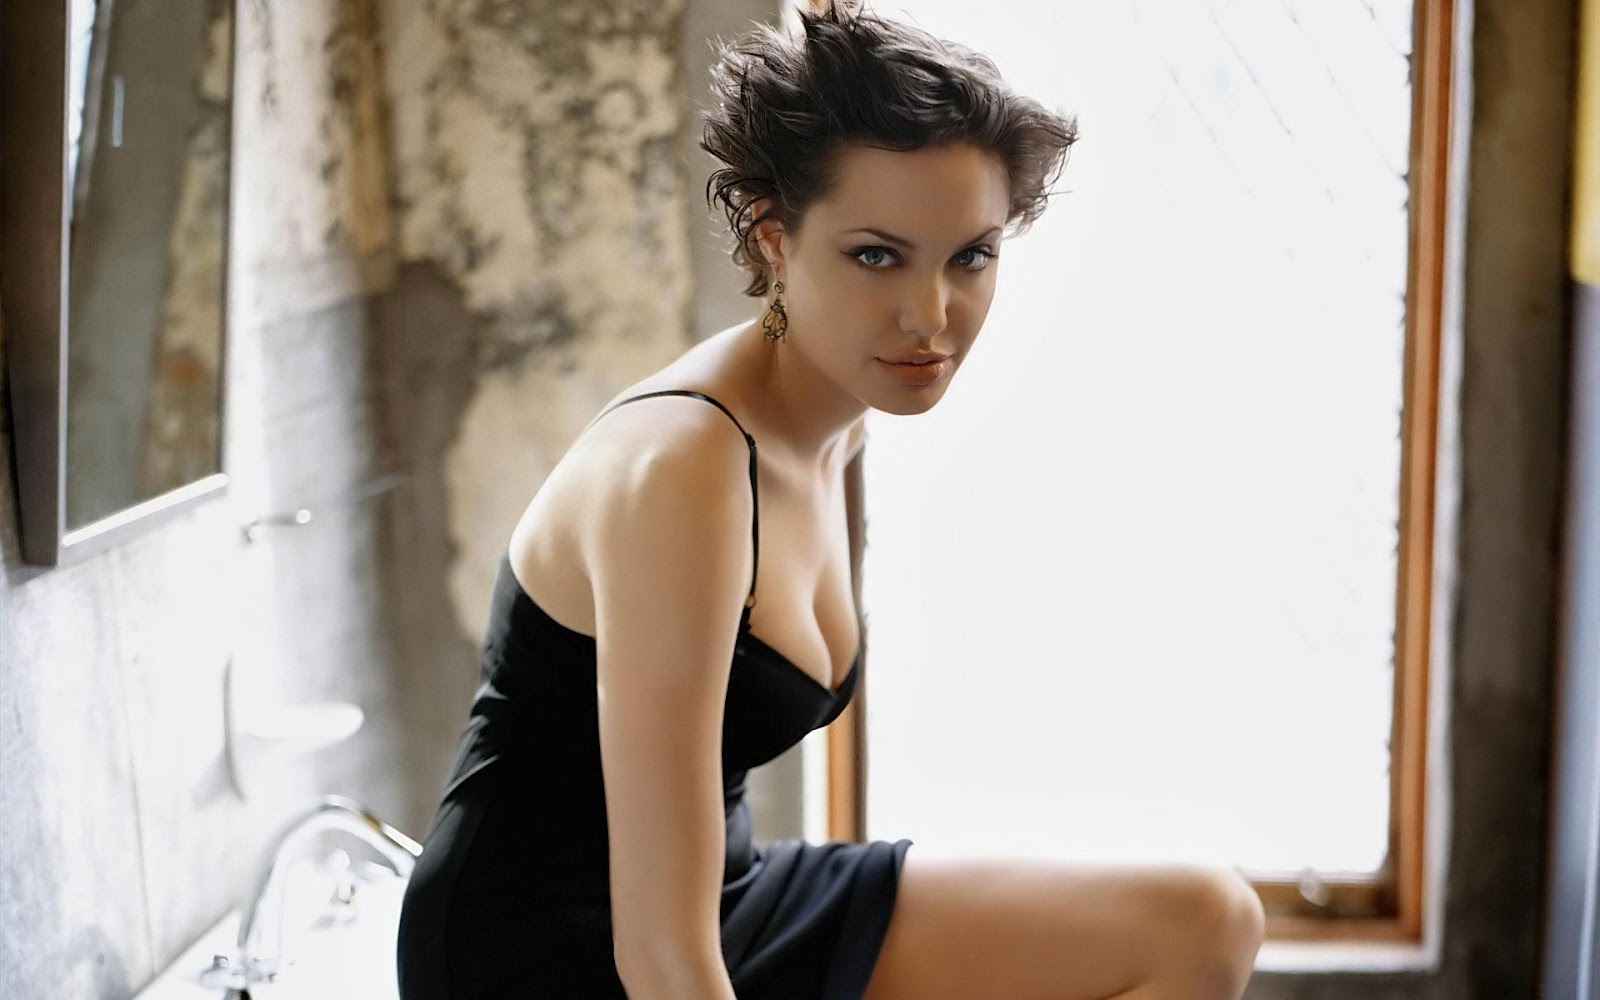 Lena meyer- landrut nude